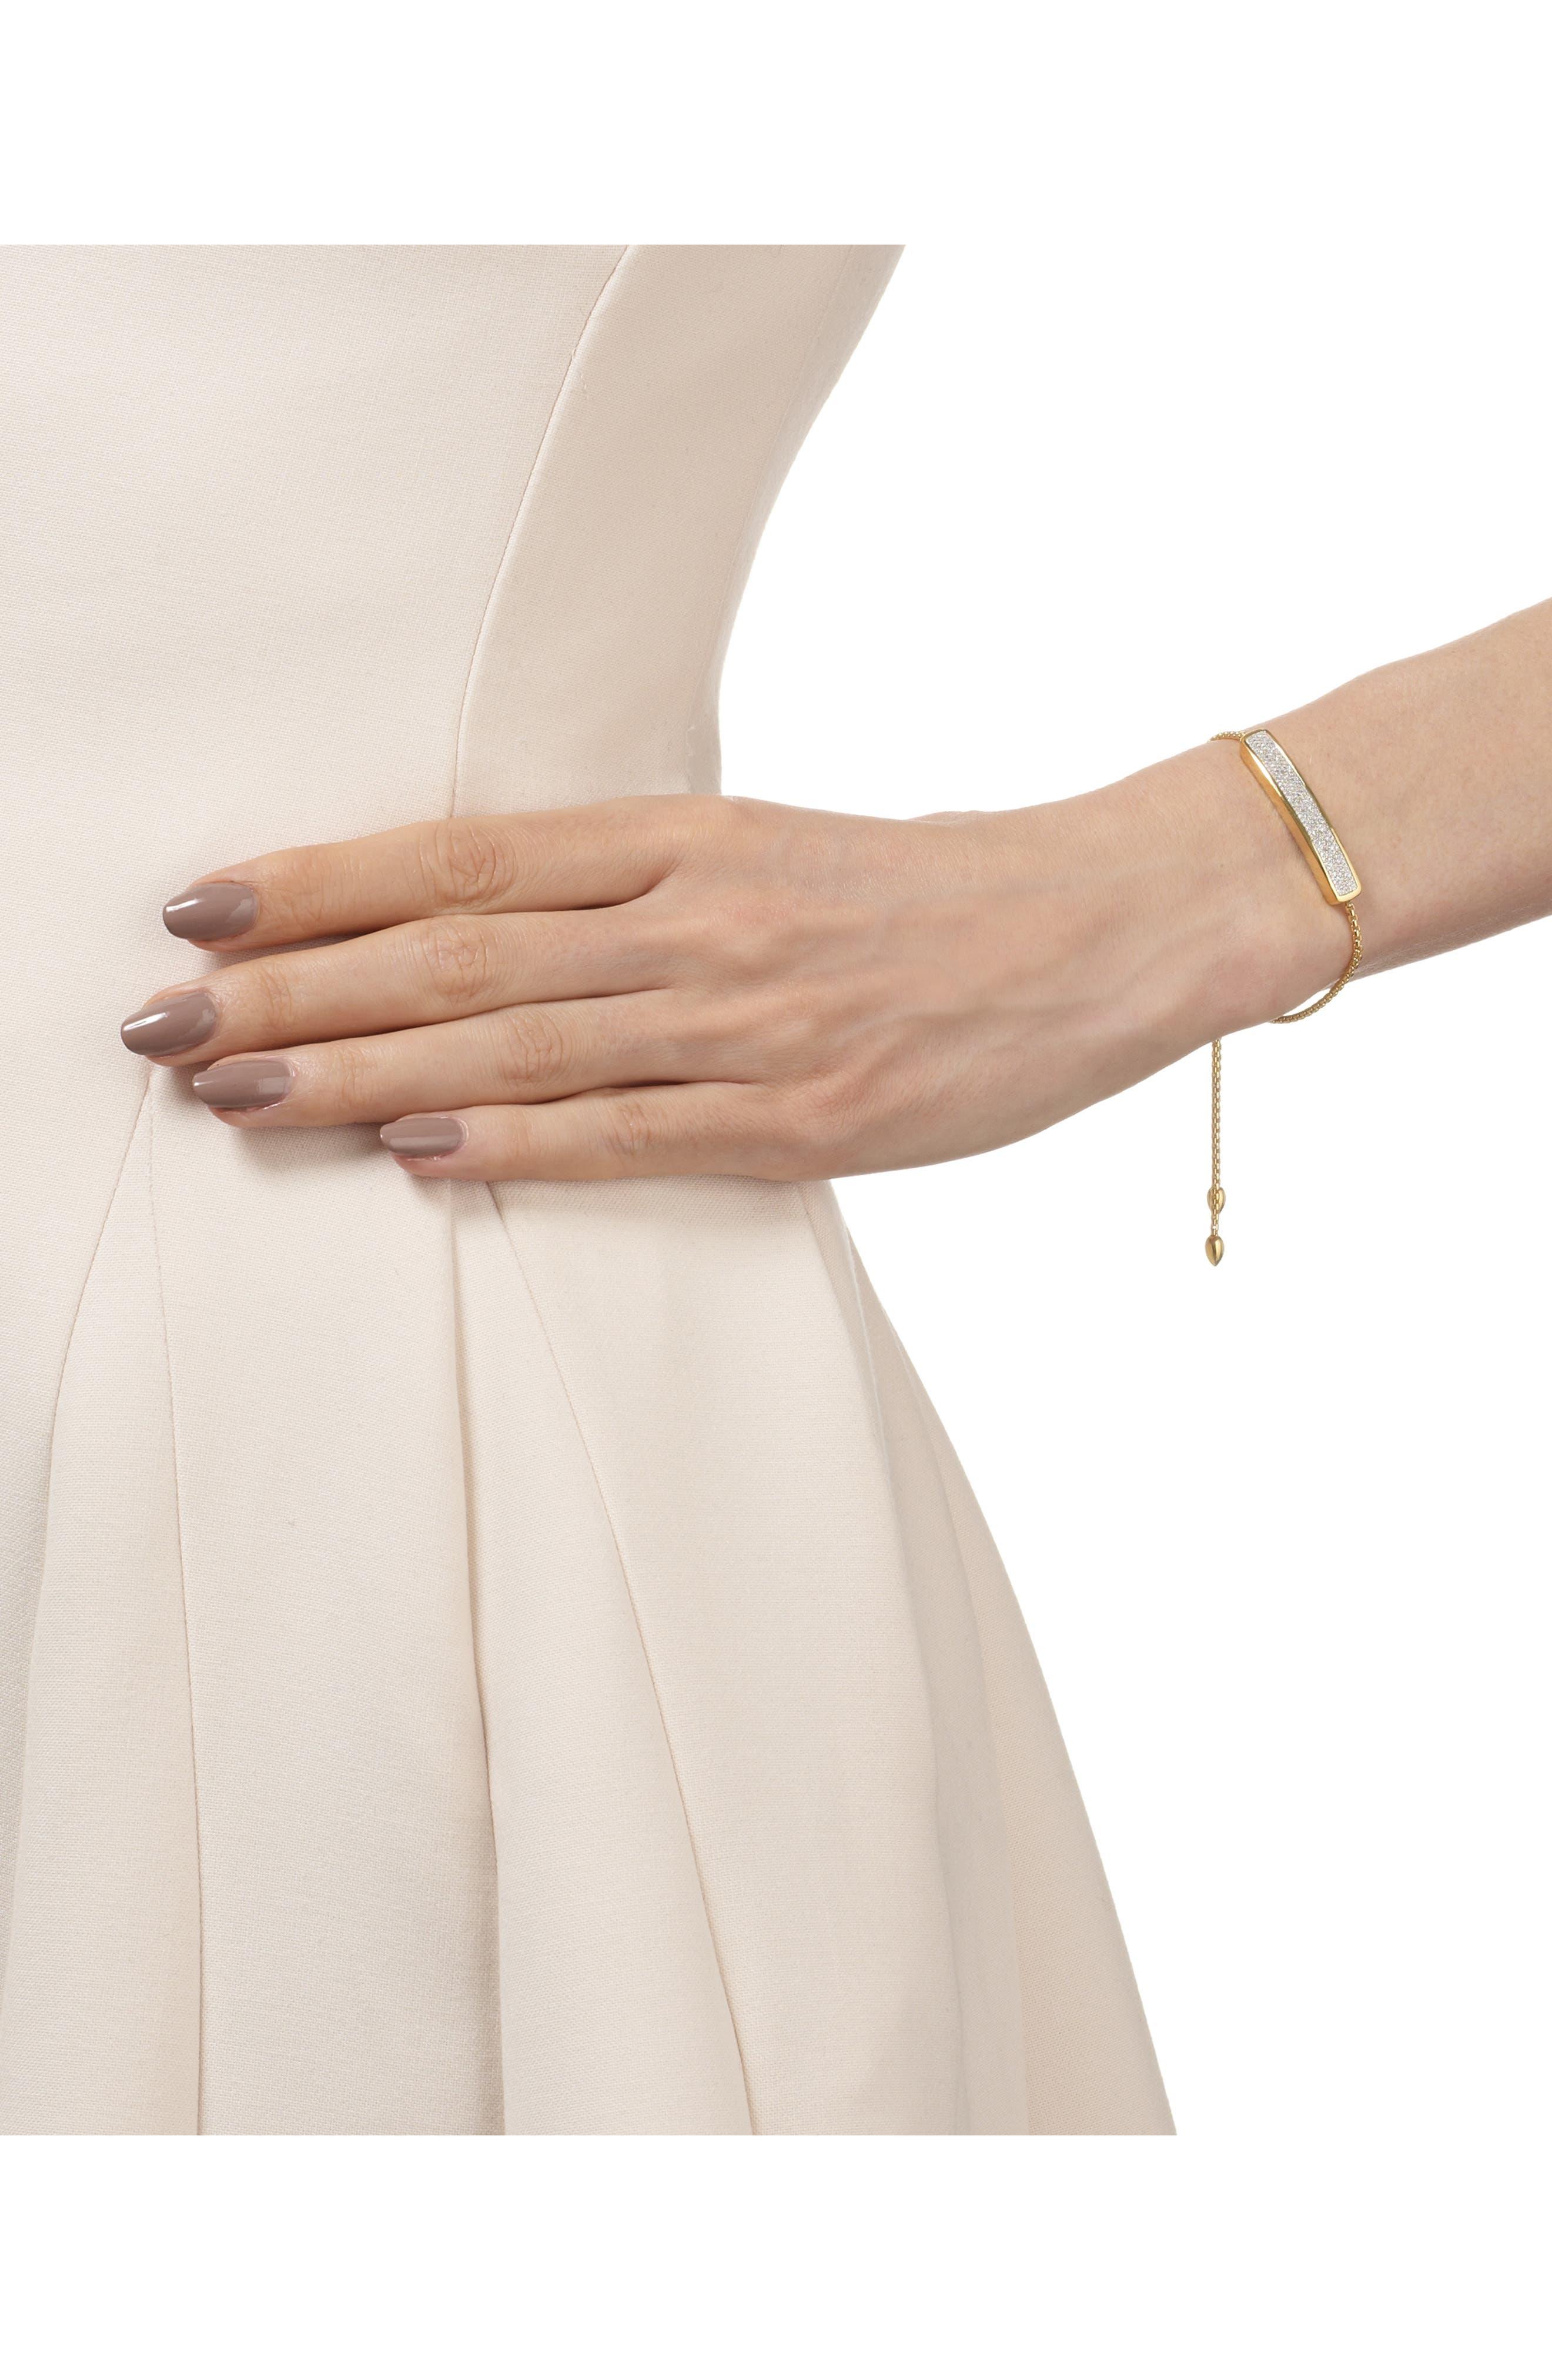 MONICA VINADER, Engravable Baja Diamond Bracelet, Alternate thumbnail 2, color, YELLOW GOLD/ DIAMOND